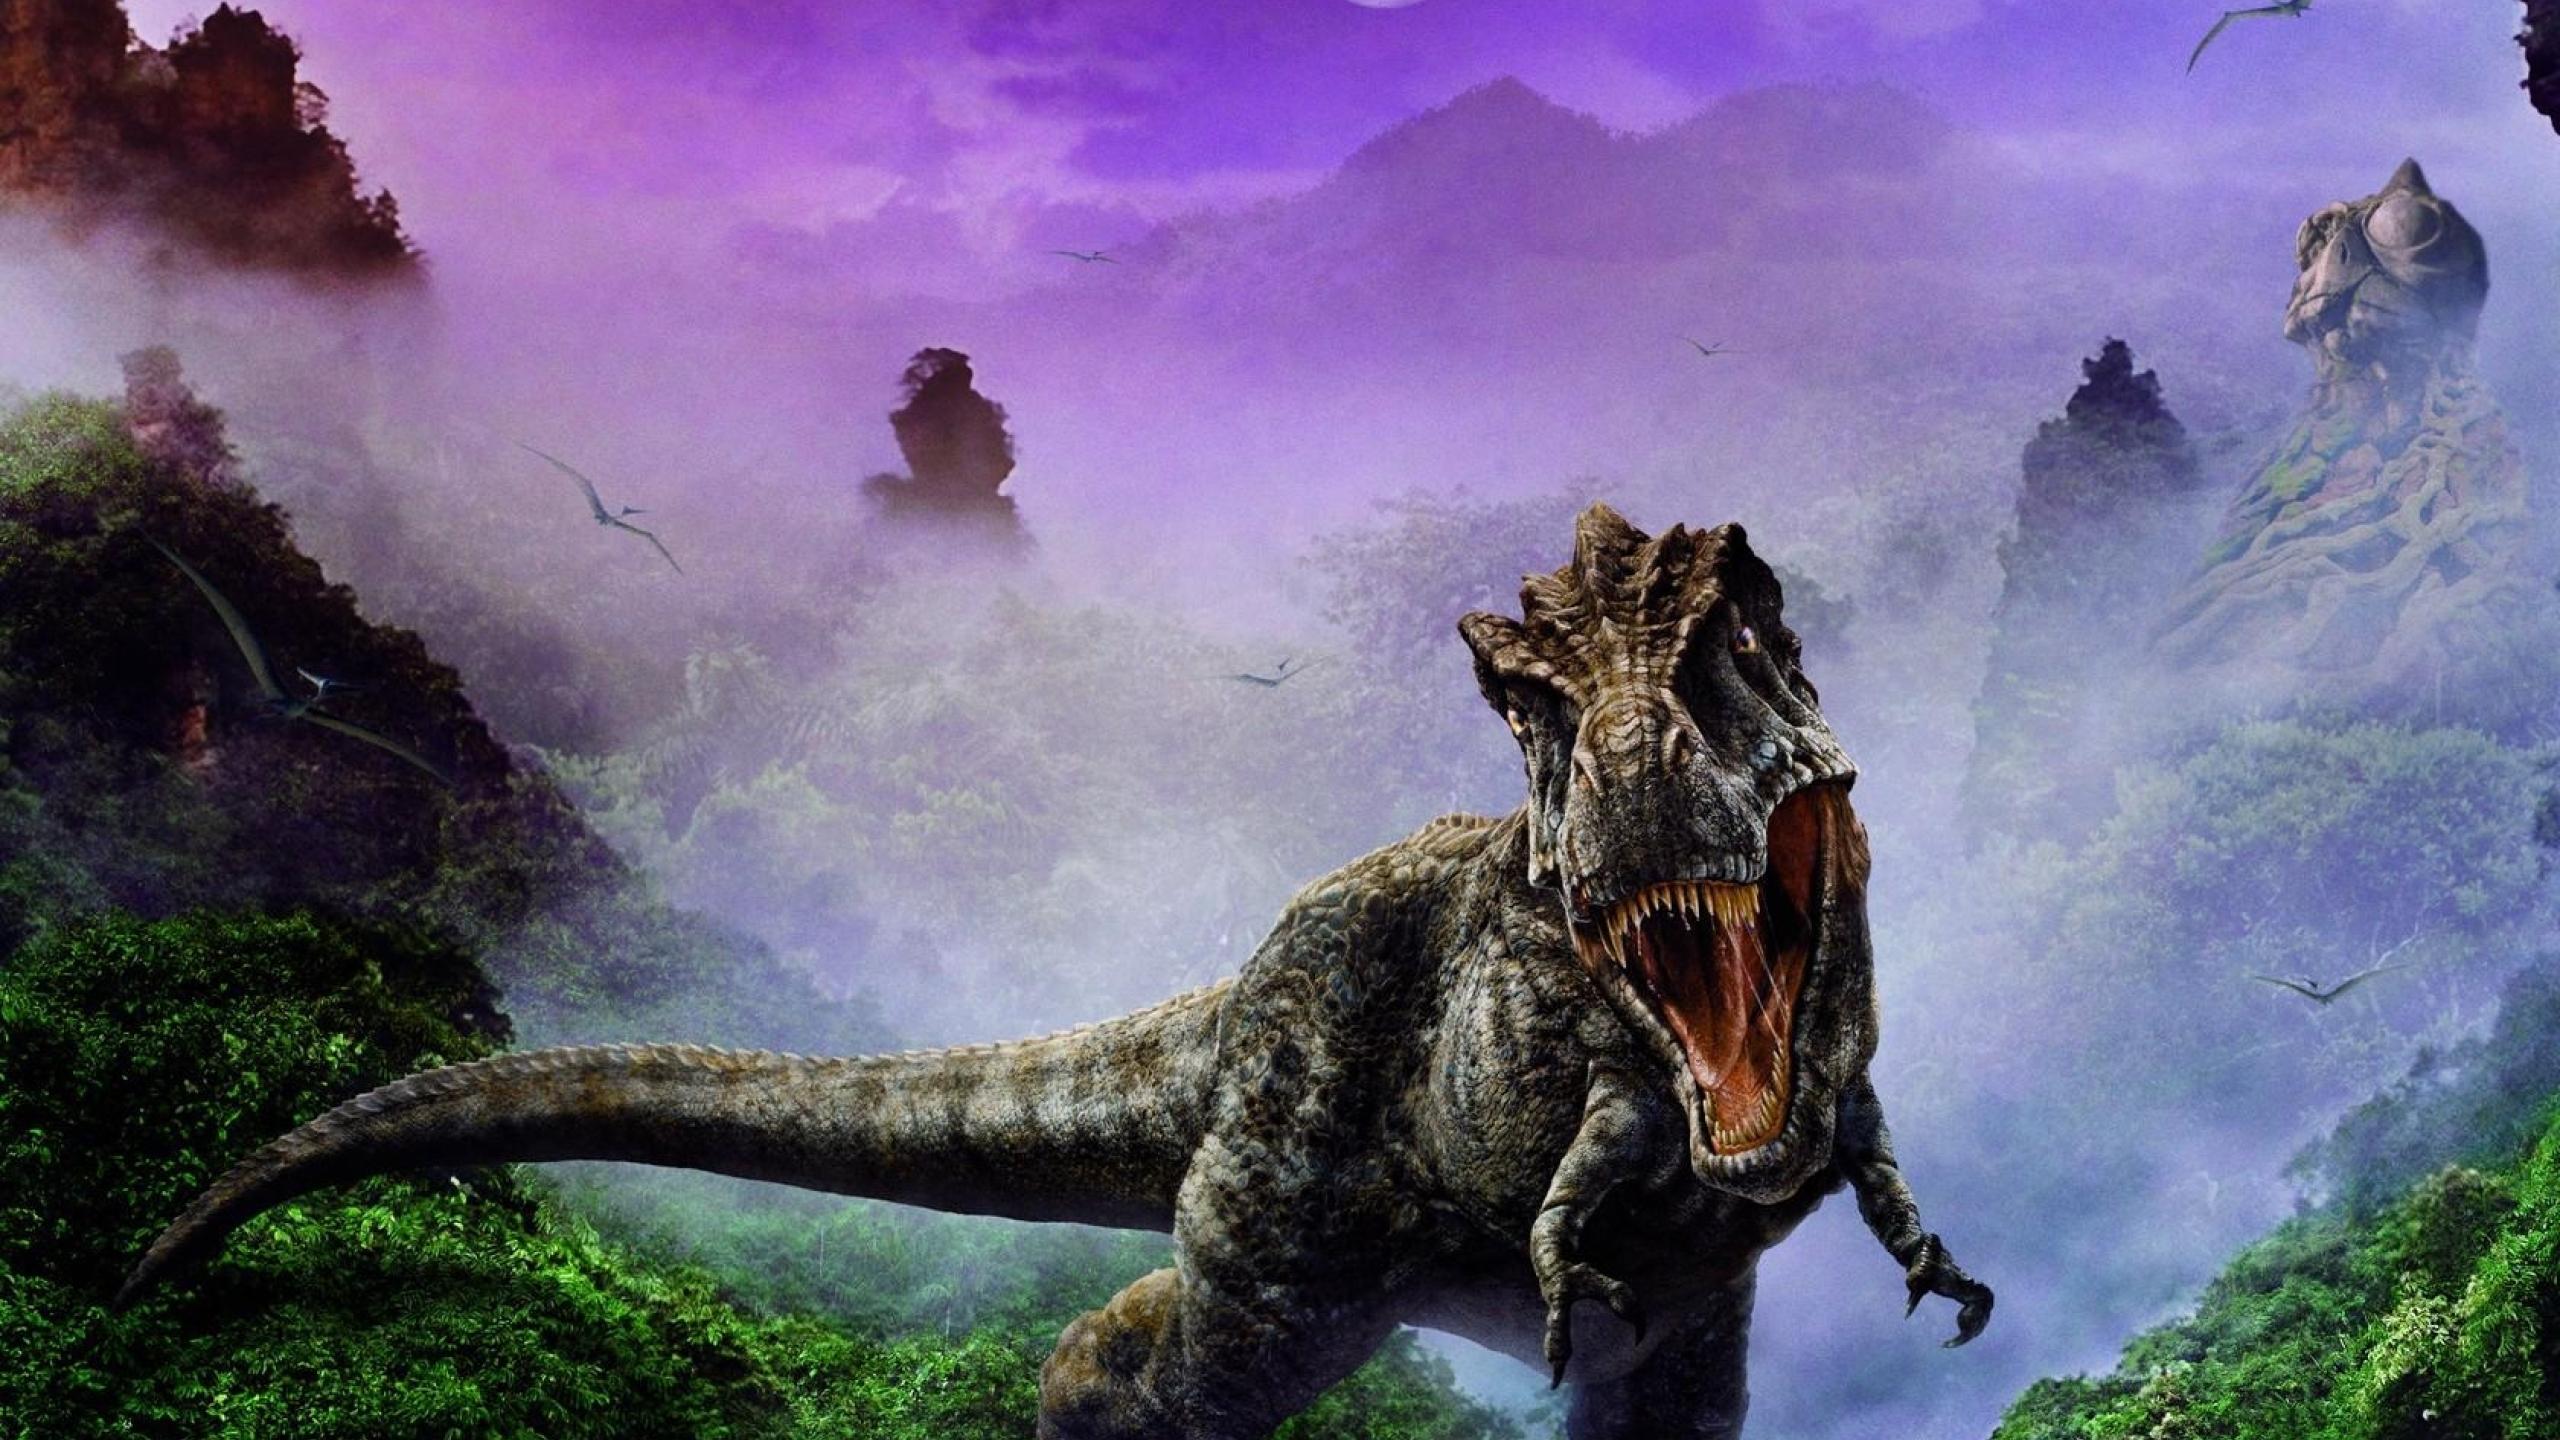 2560x1440 Dinosaur Jaws Fangs 1440p Resolution Wallpaper